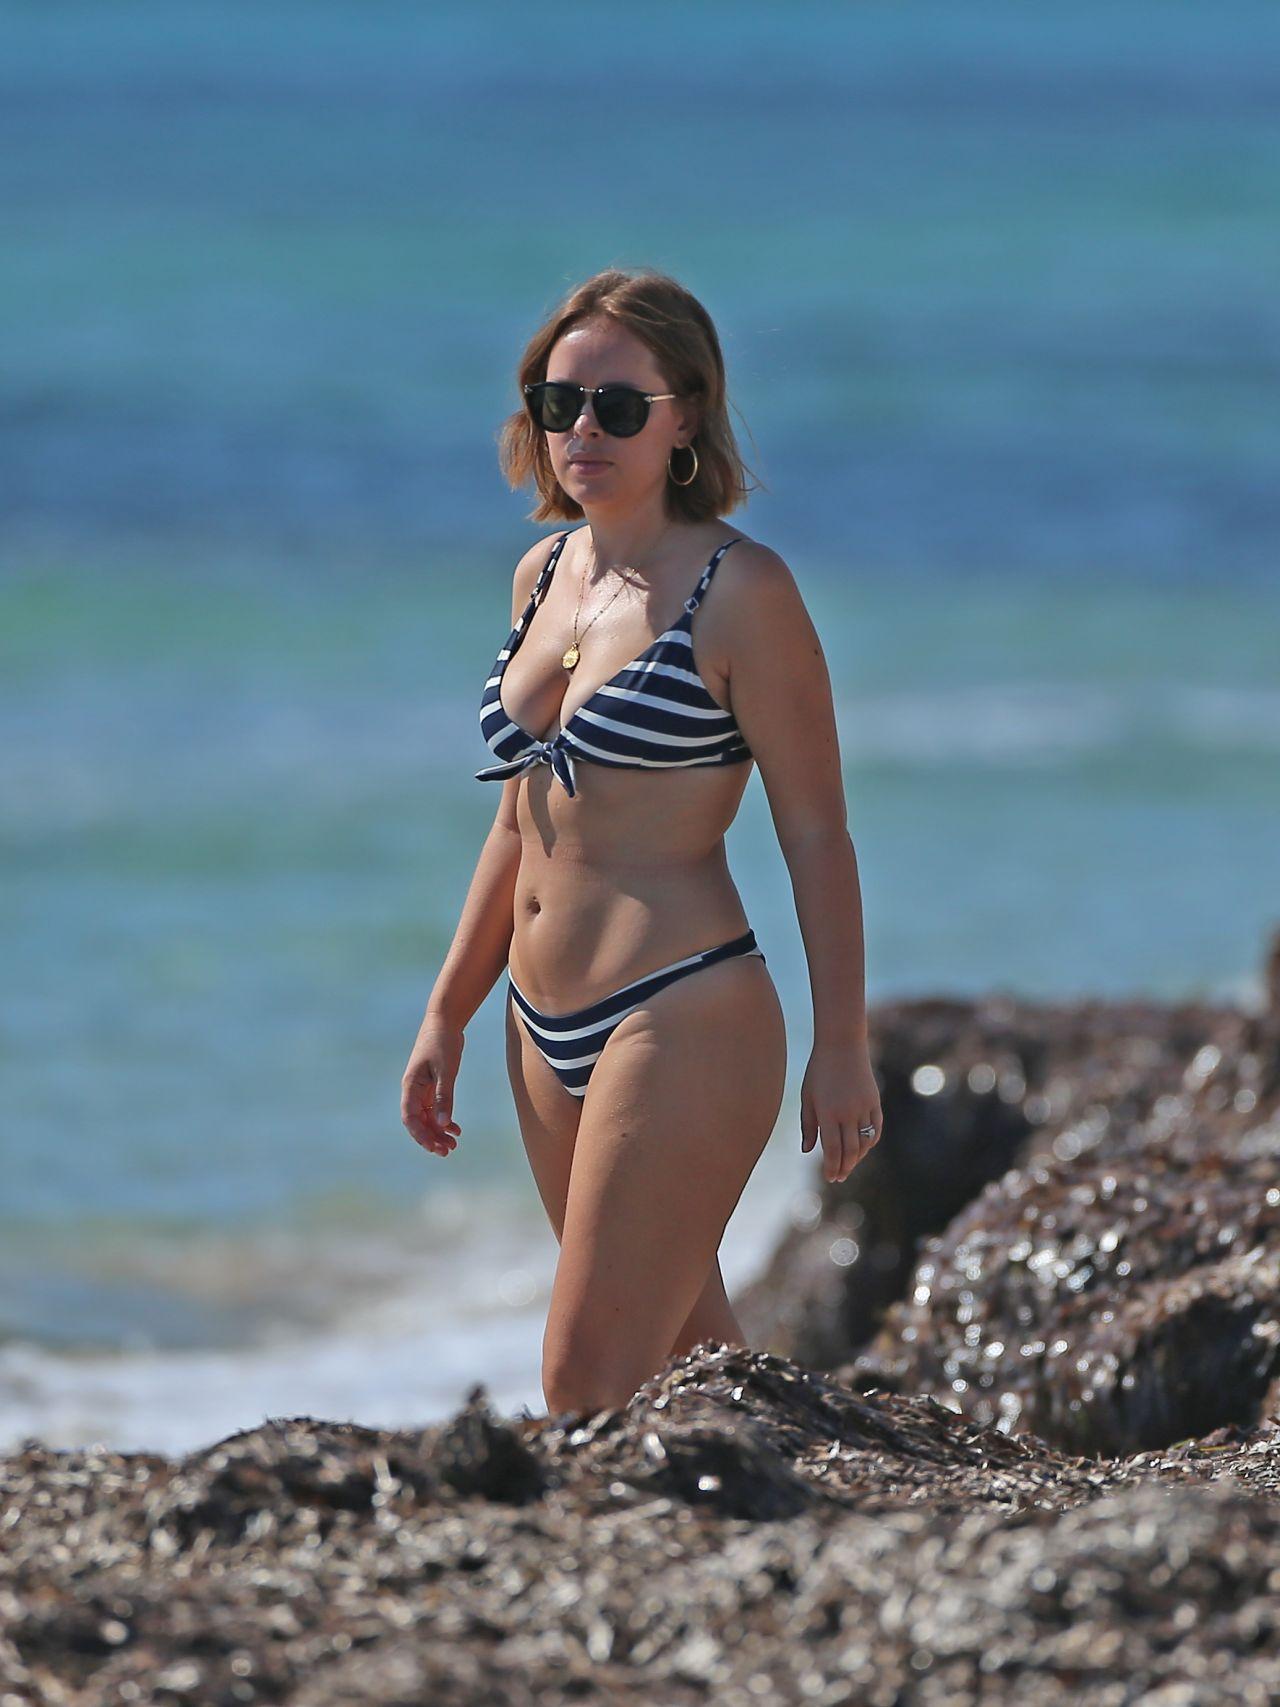 Bikini Tanya Burr nude (14 foto and video), Sexy, Bikini, Twitter, butt 2018